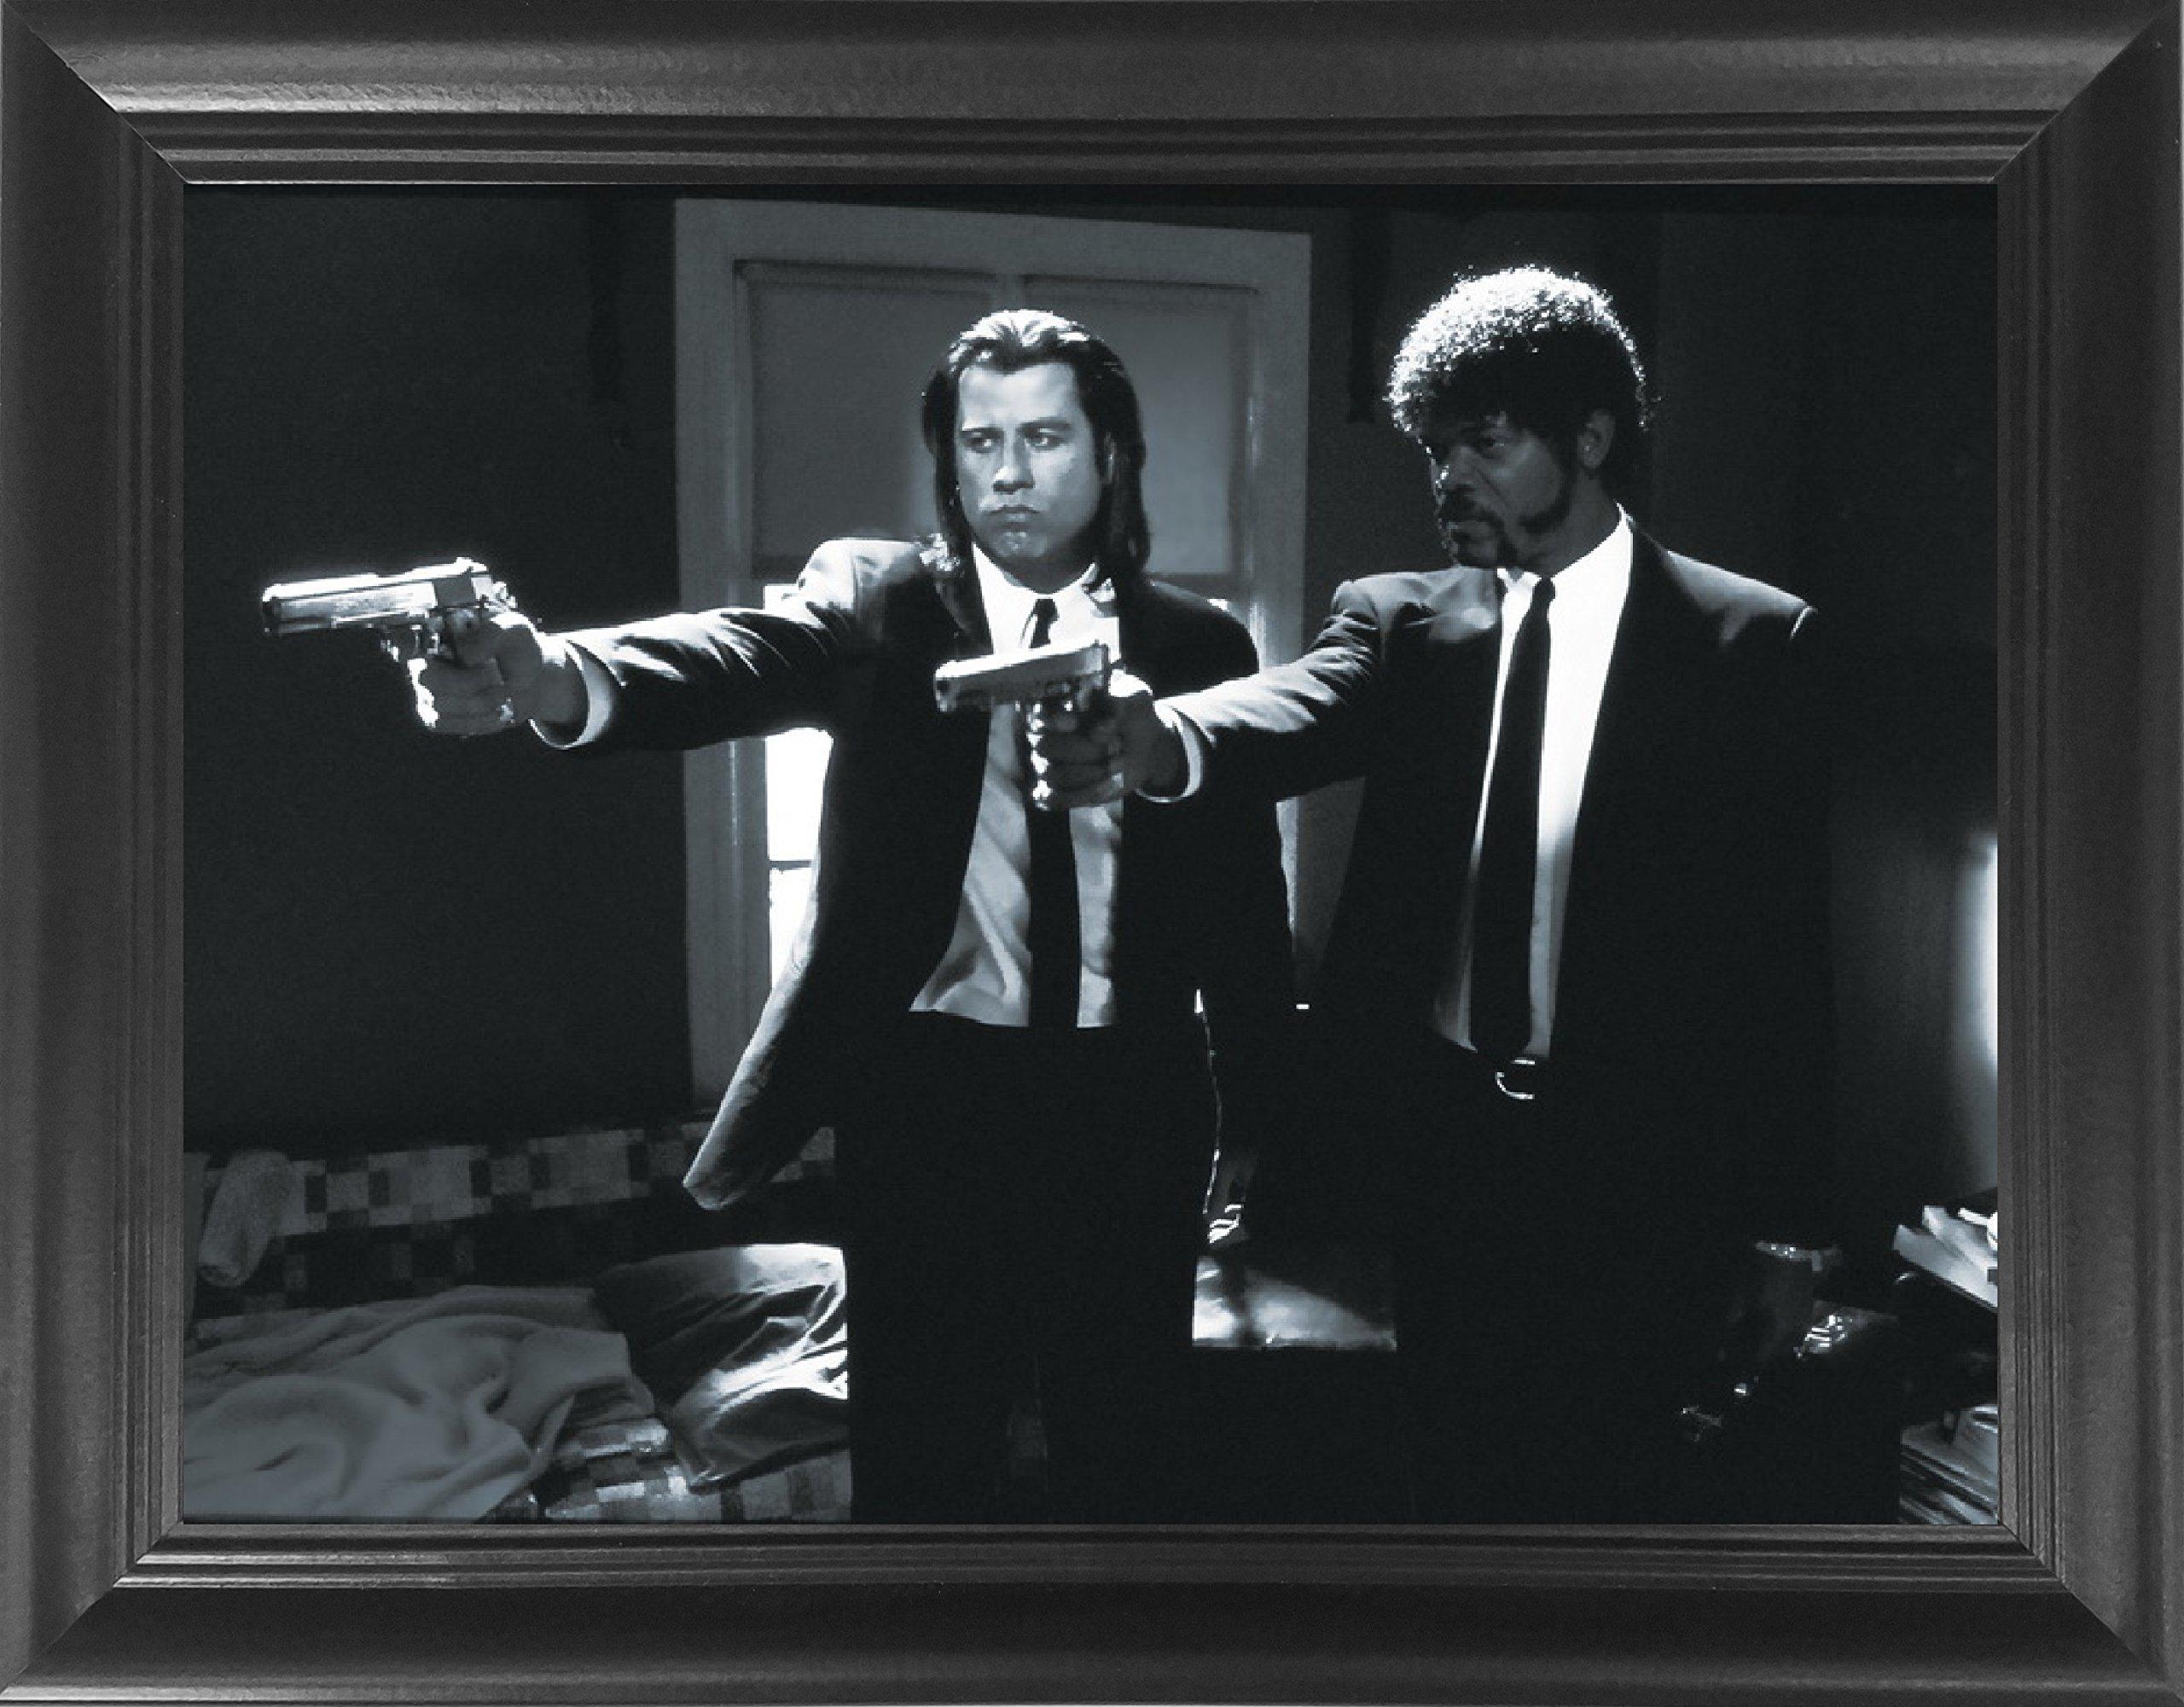 Pulp Fiction John Travolta & Samuel L Jackson Framed 3D Lenticular Movie Poster - 14.5x18.5 - Quentin Tarantino - Unbelievable Life Like Framed 3D Art Picture, Cool Art Deco, Unique Wall Art Décor